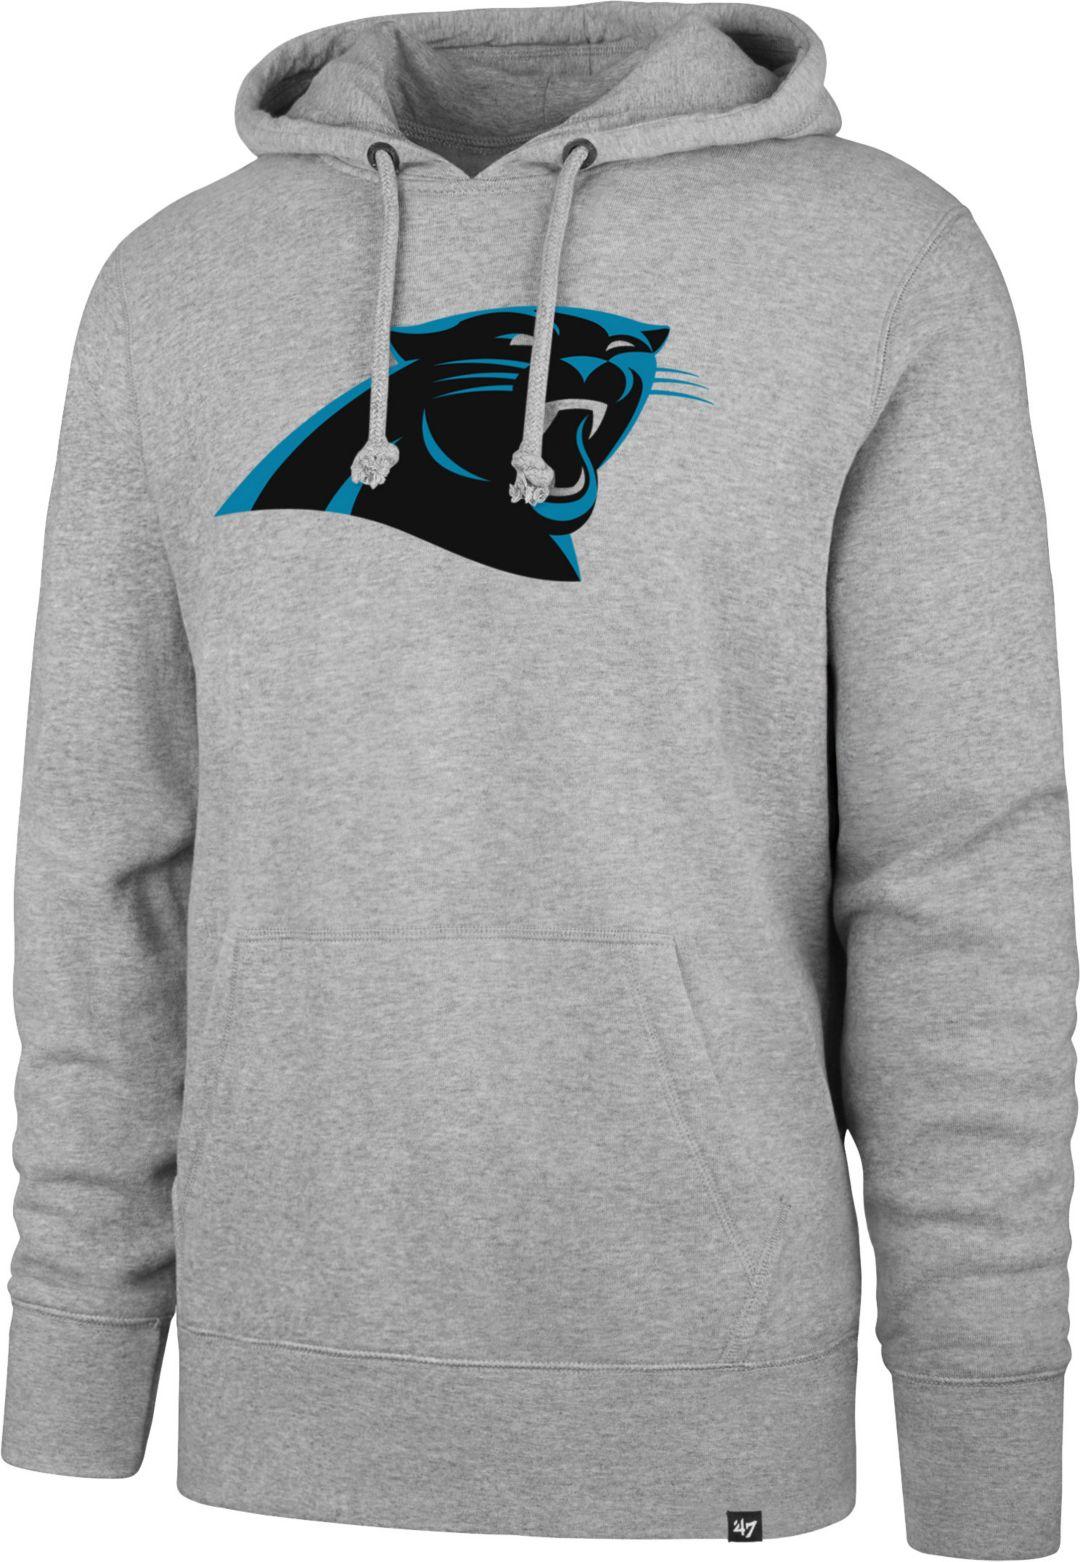 9d33f8fd '47 Men's Carolina Panthers Headline Grey Hoodie